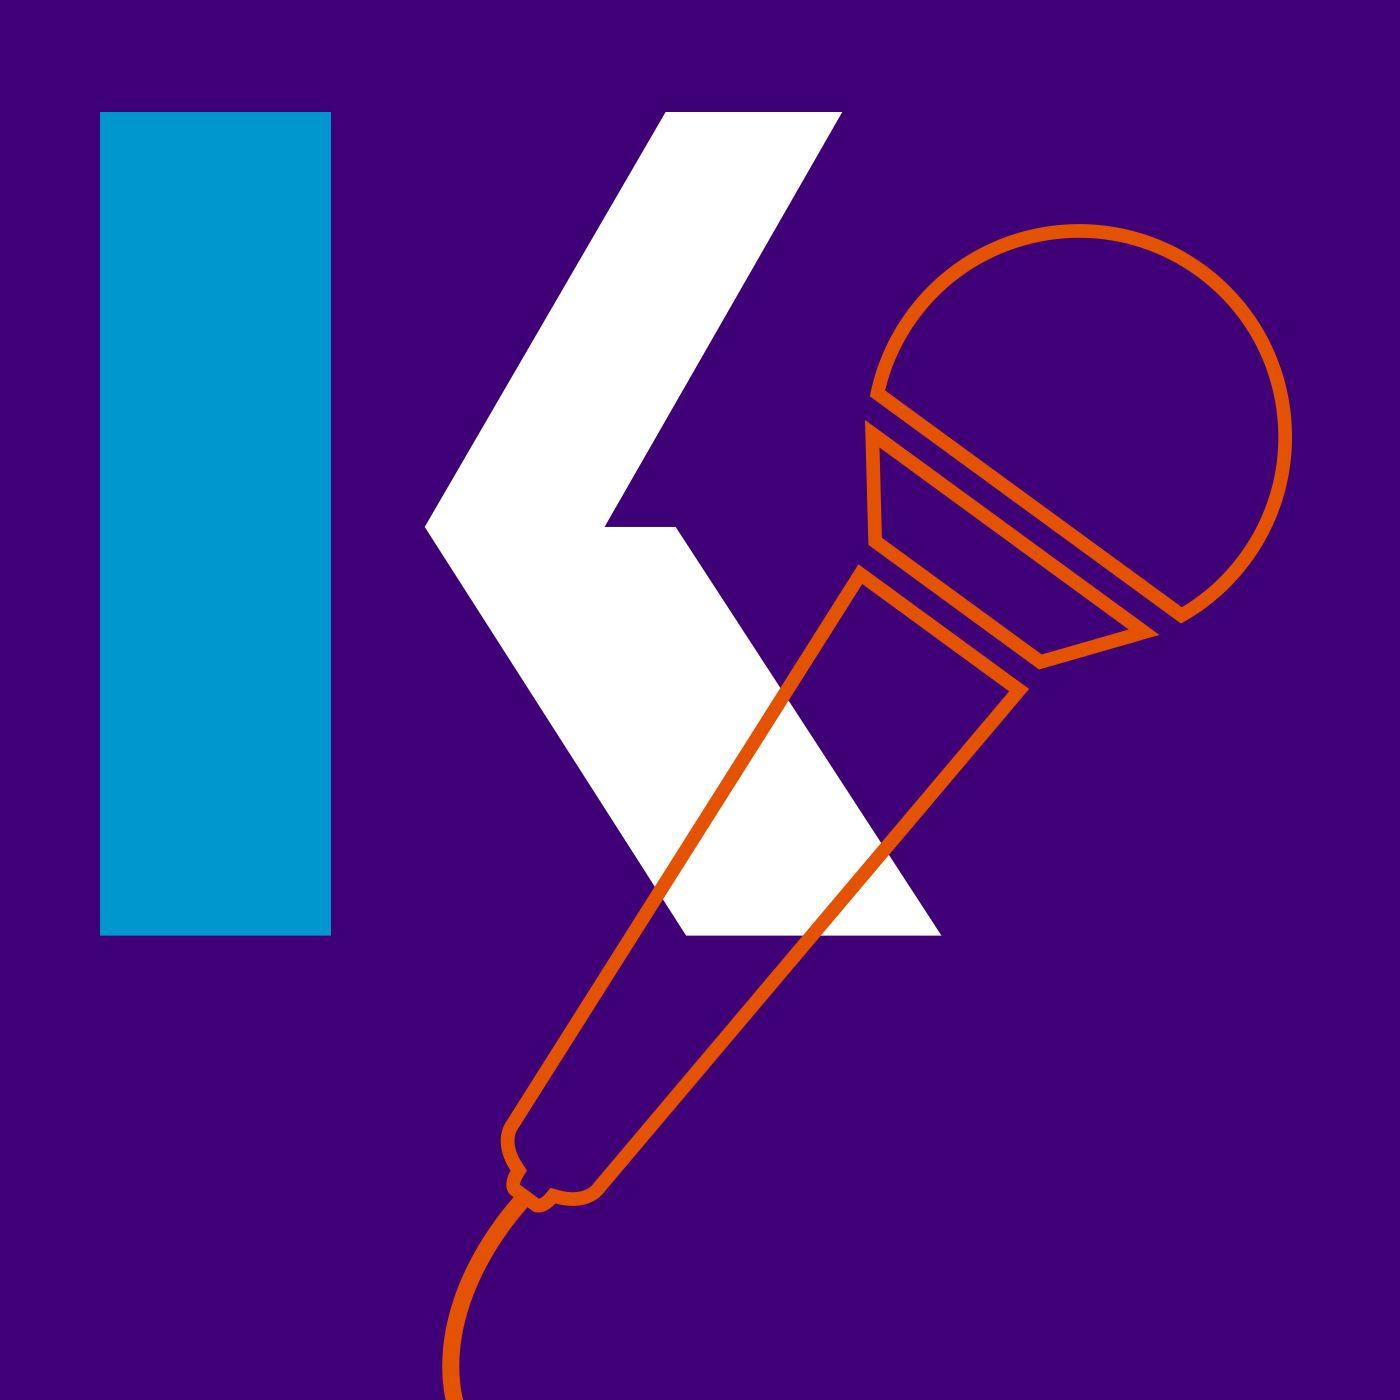 Kaplan's NCLEX Prepcast - Episode 21 - Staying healthy as a nurse or nursing student